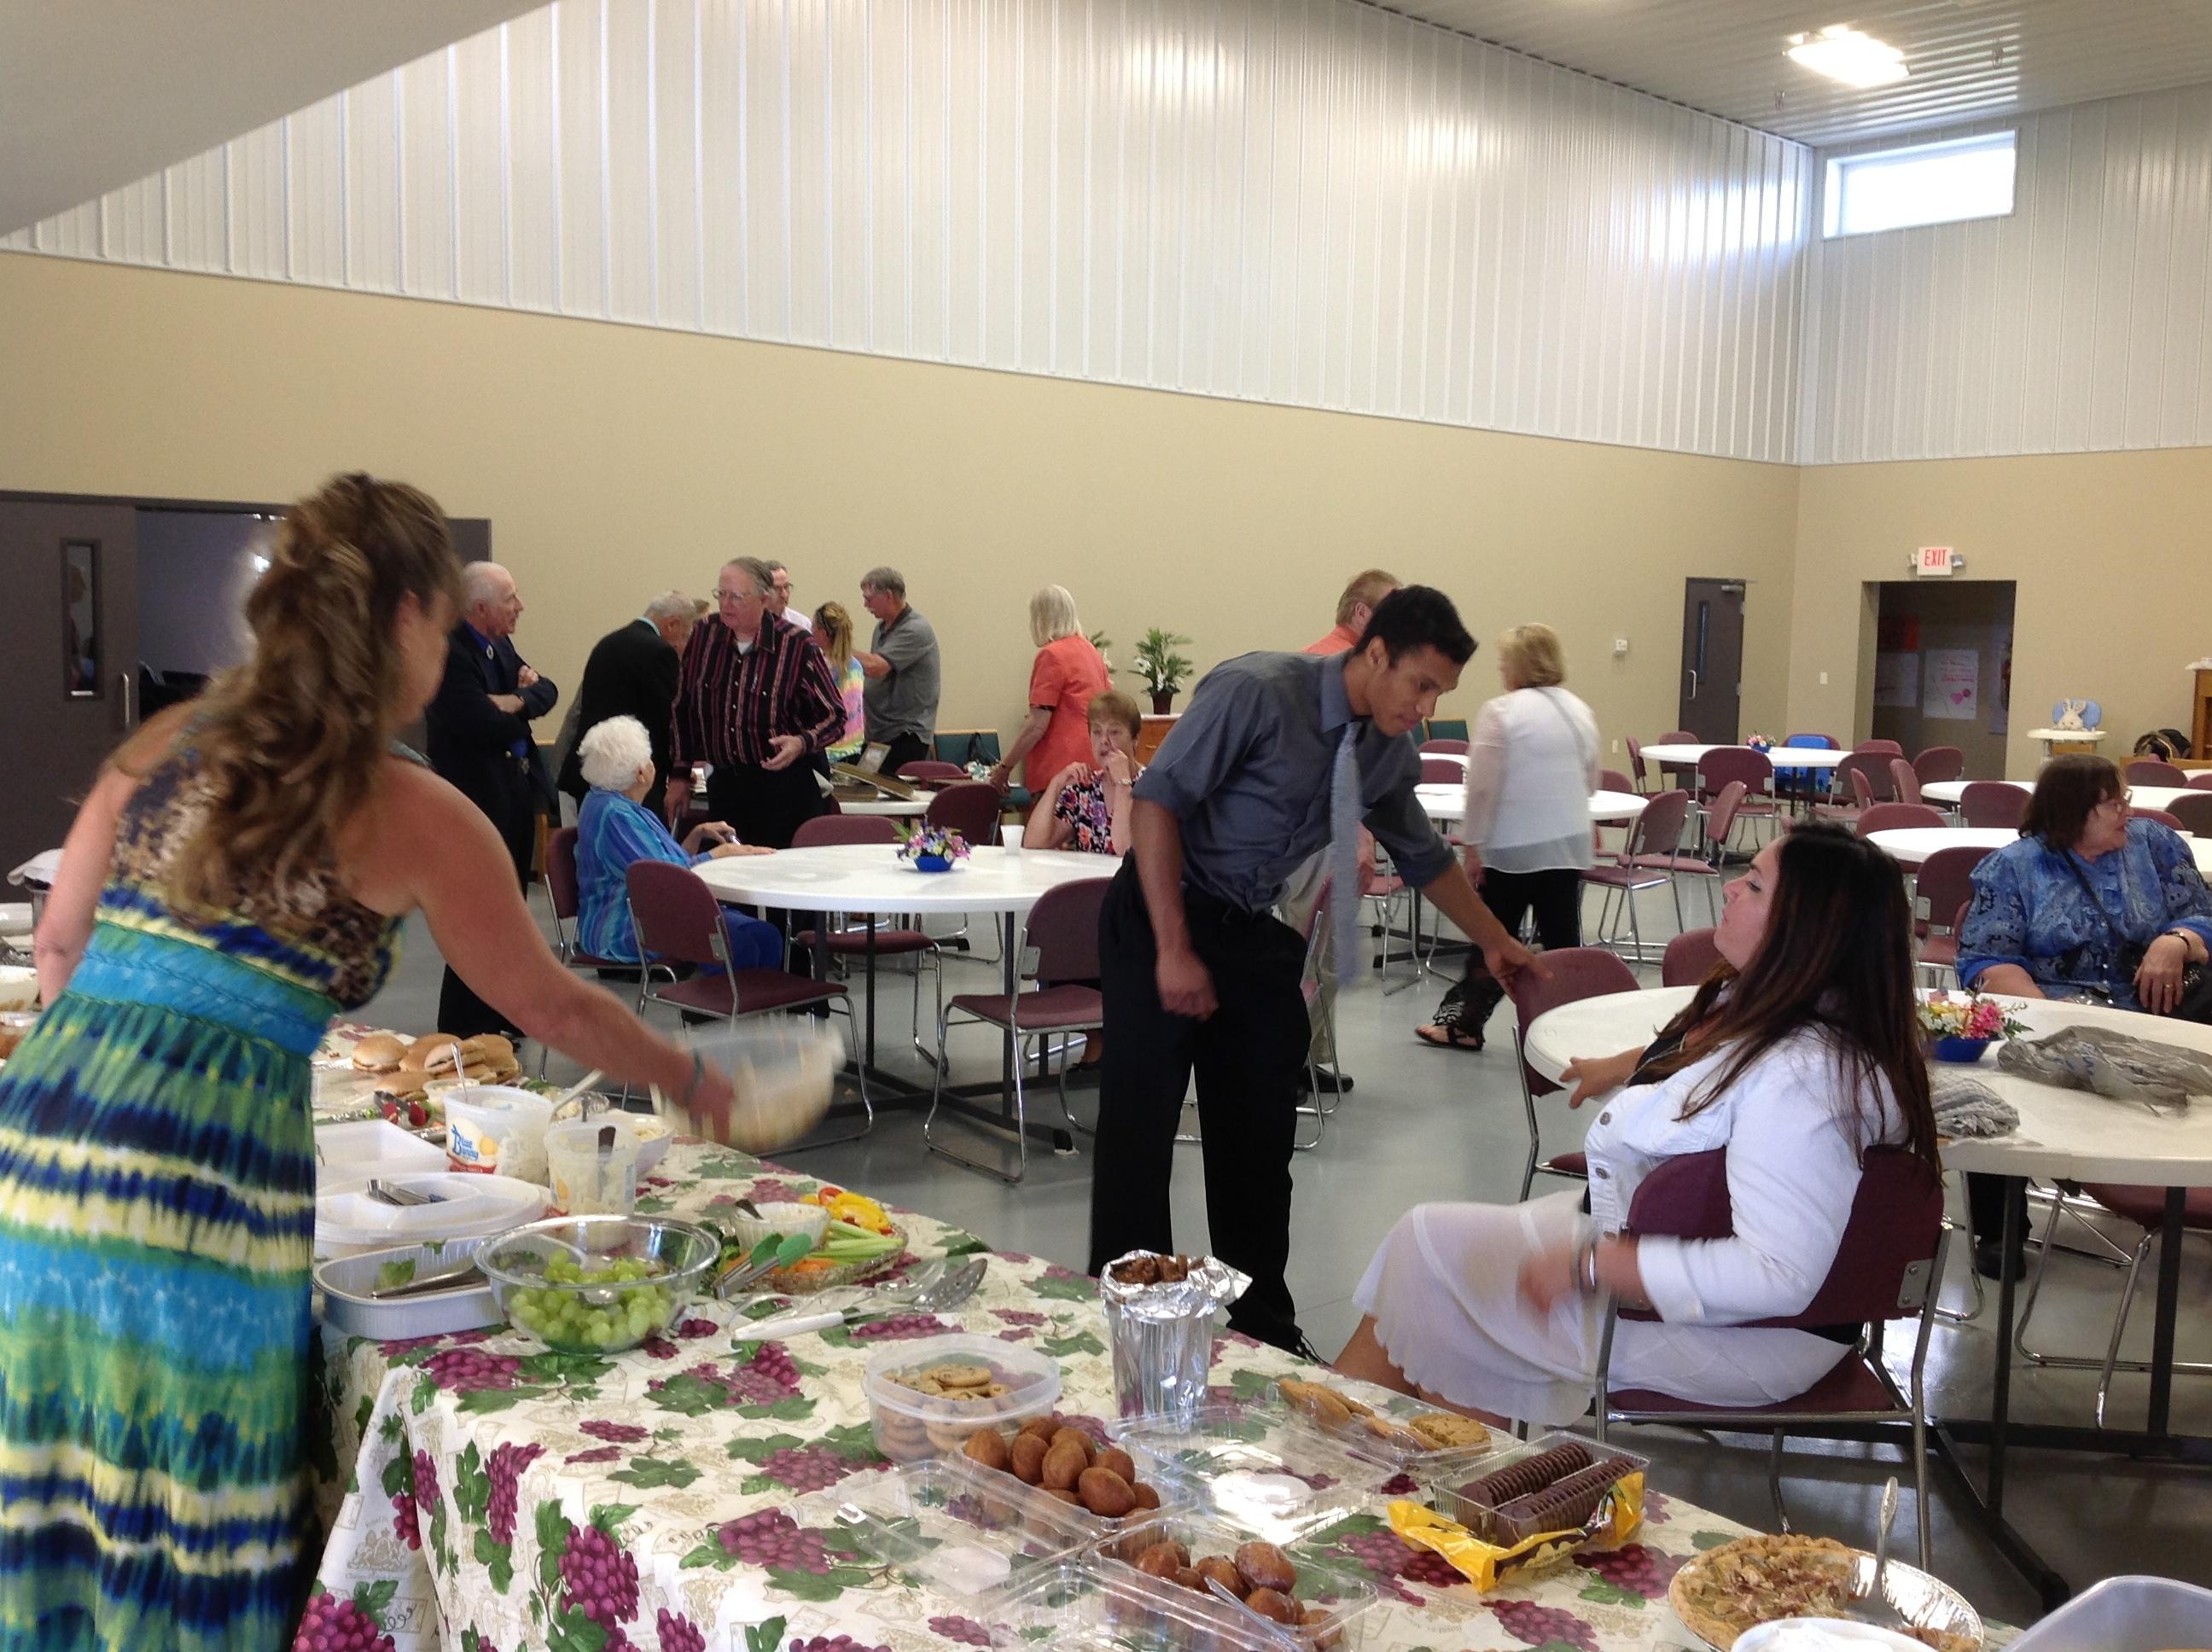 The Fargo, North Dakota congregation's 50th anniversary celebration.